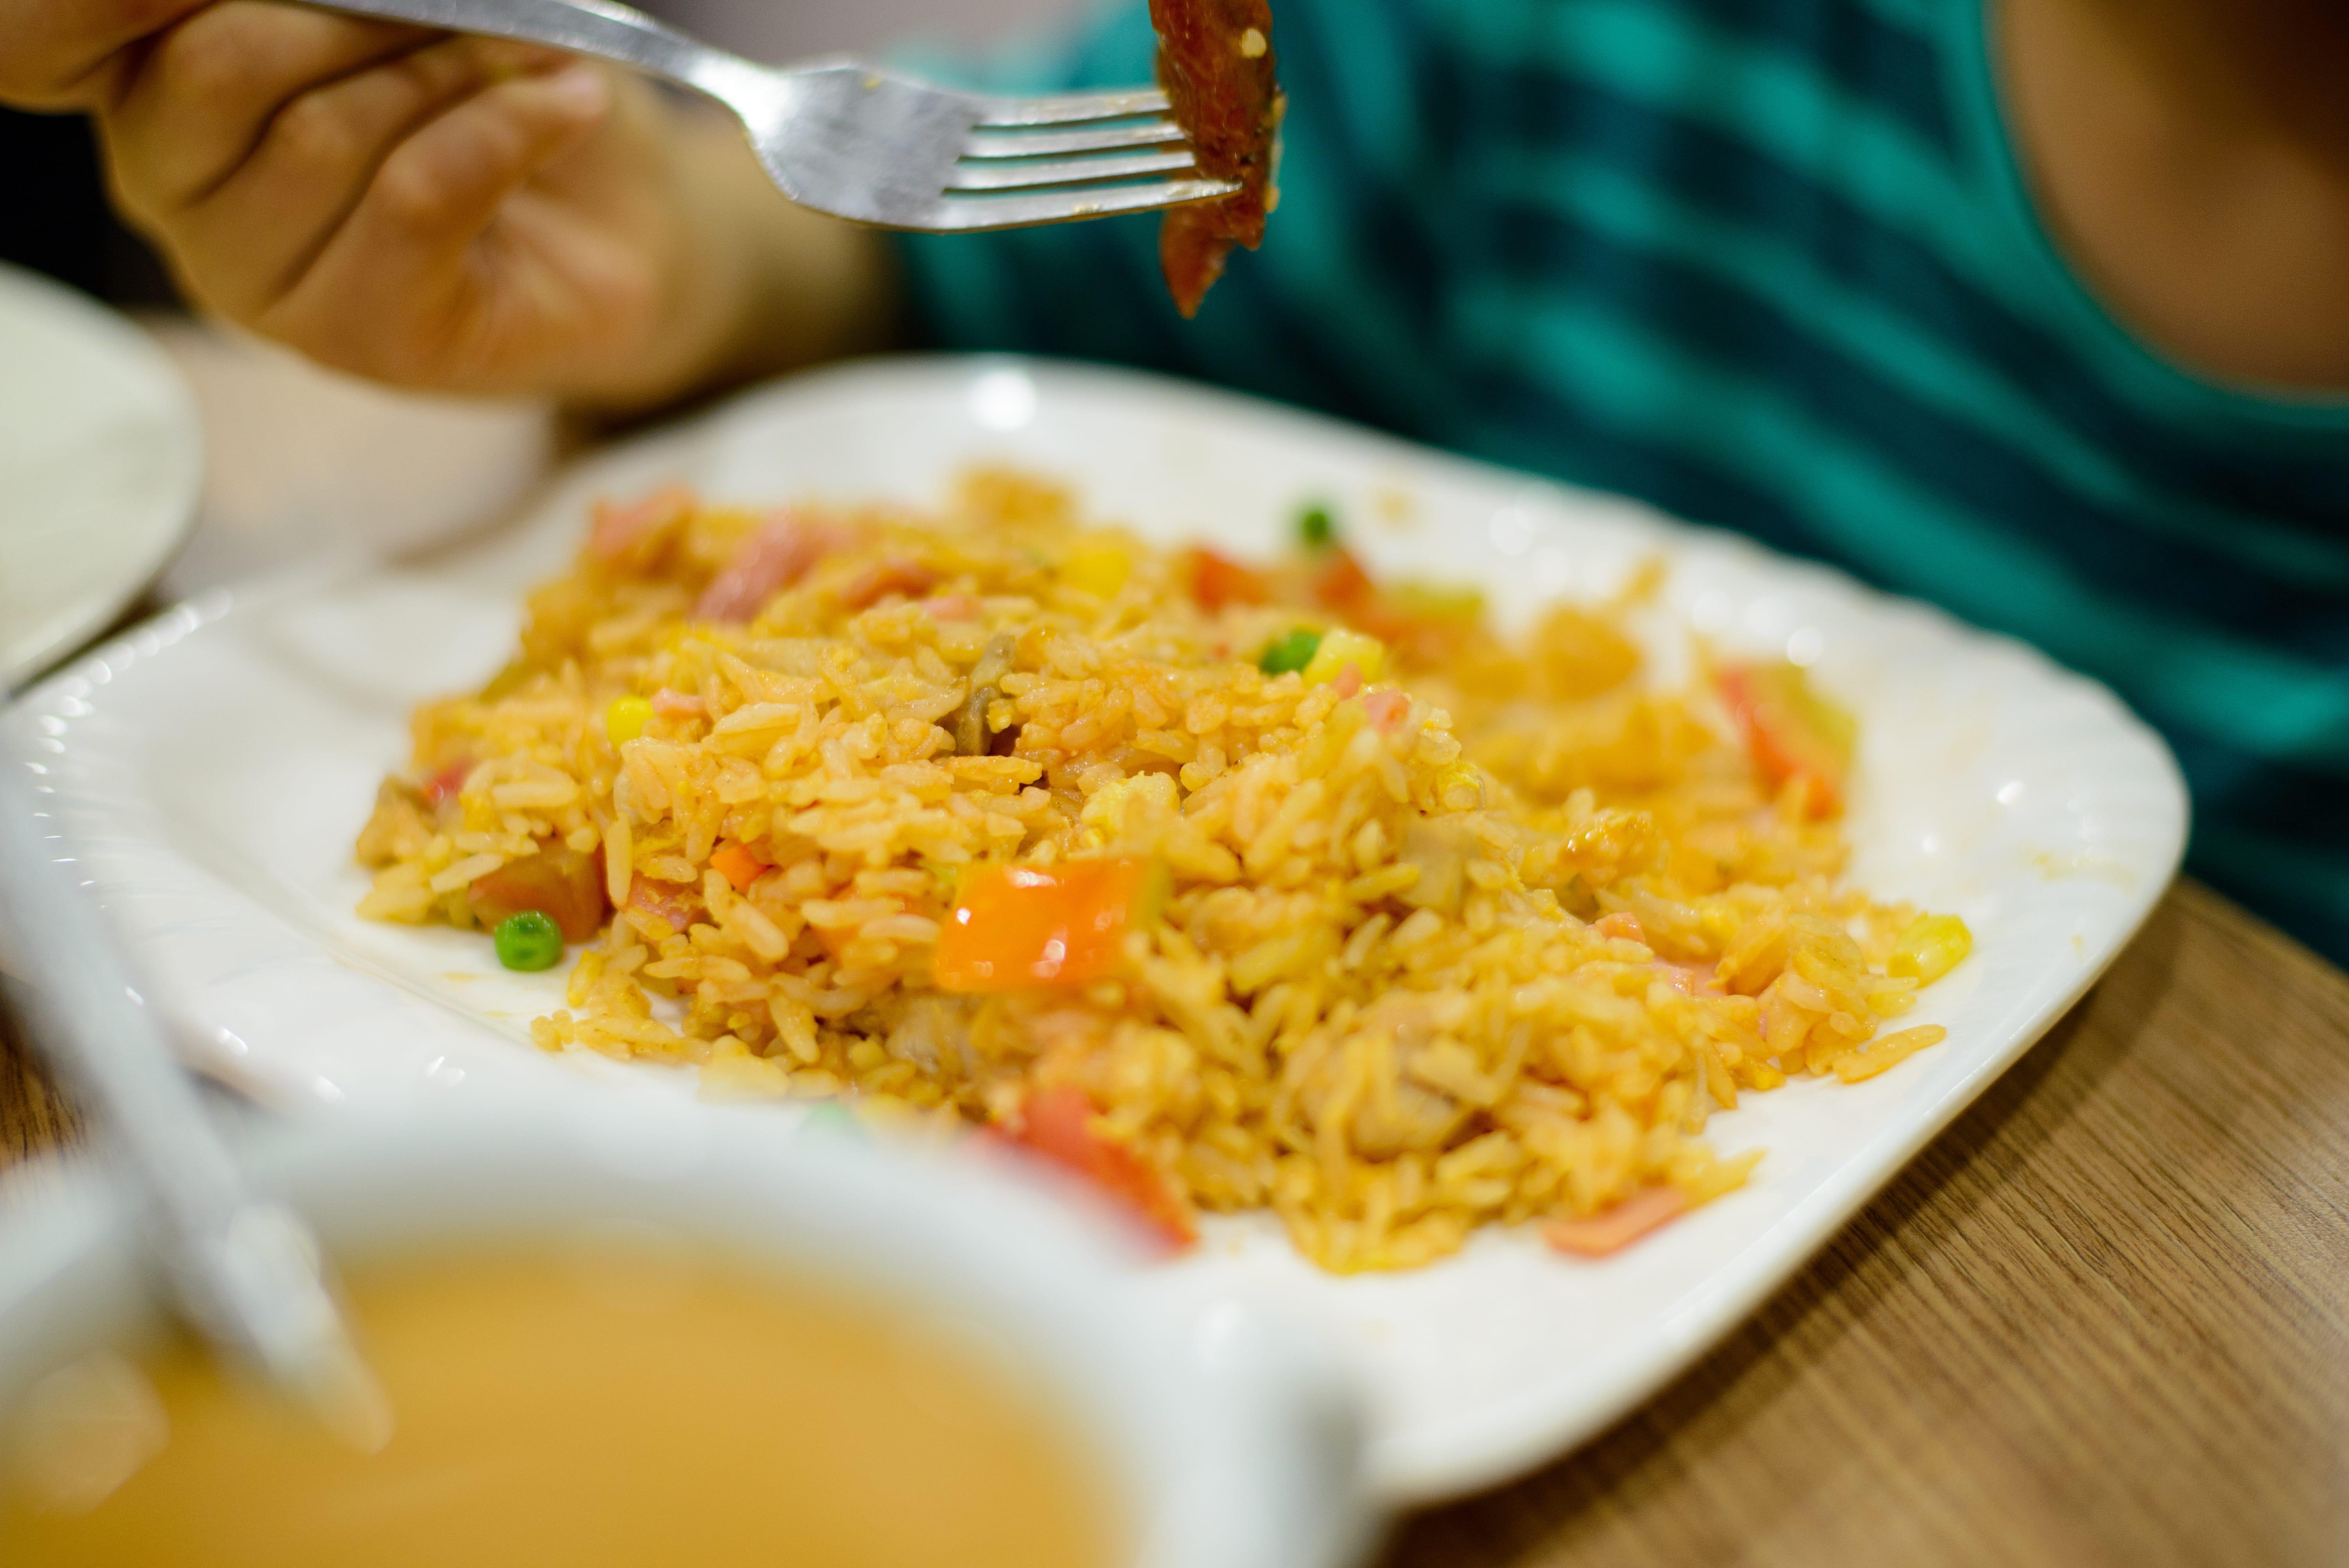 Western style fried rice - my boy's favourite